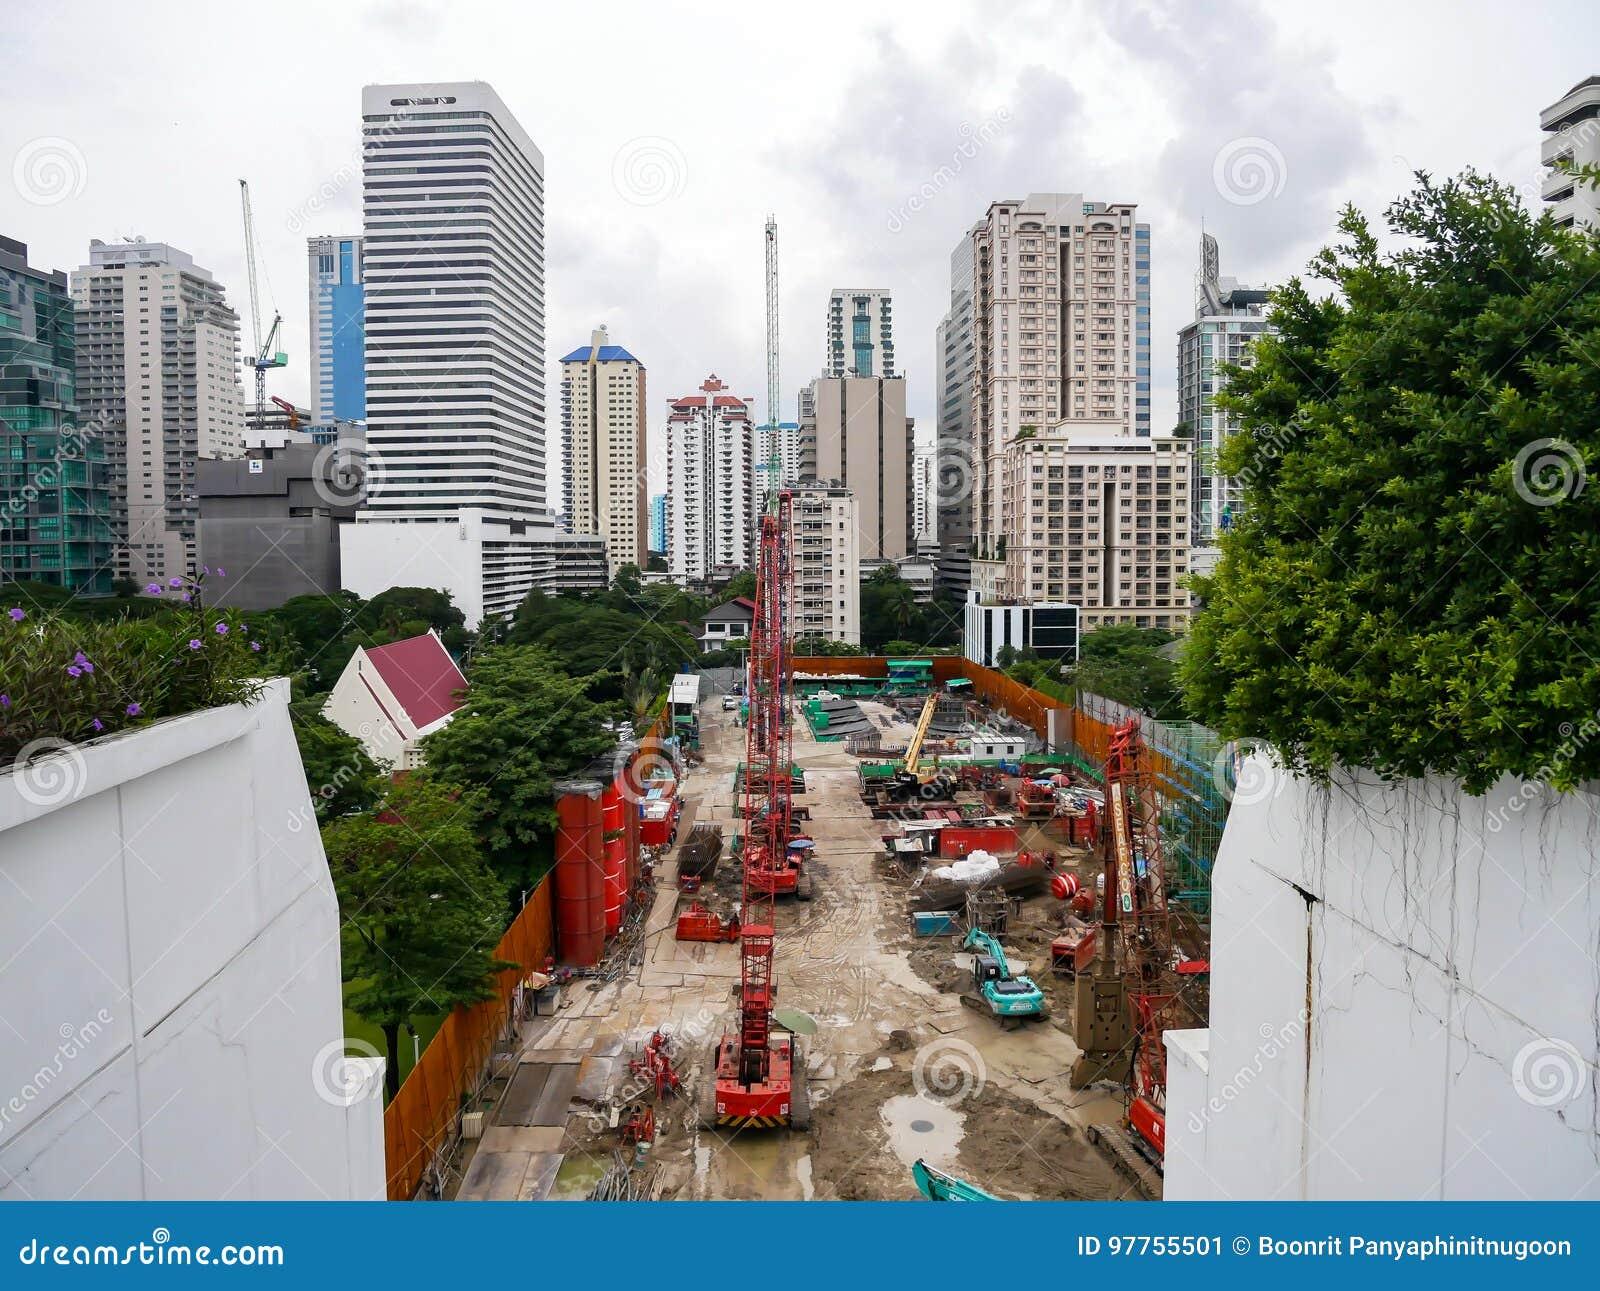 曼谷,泰国- 2017年8月6日:buil建造场所